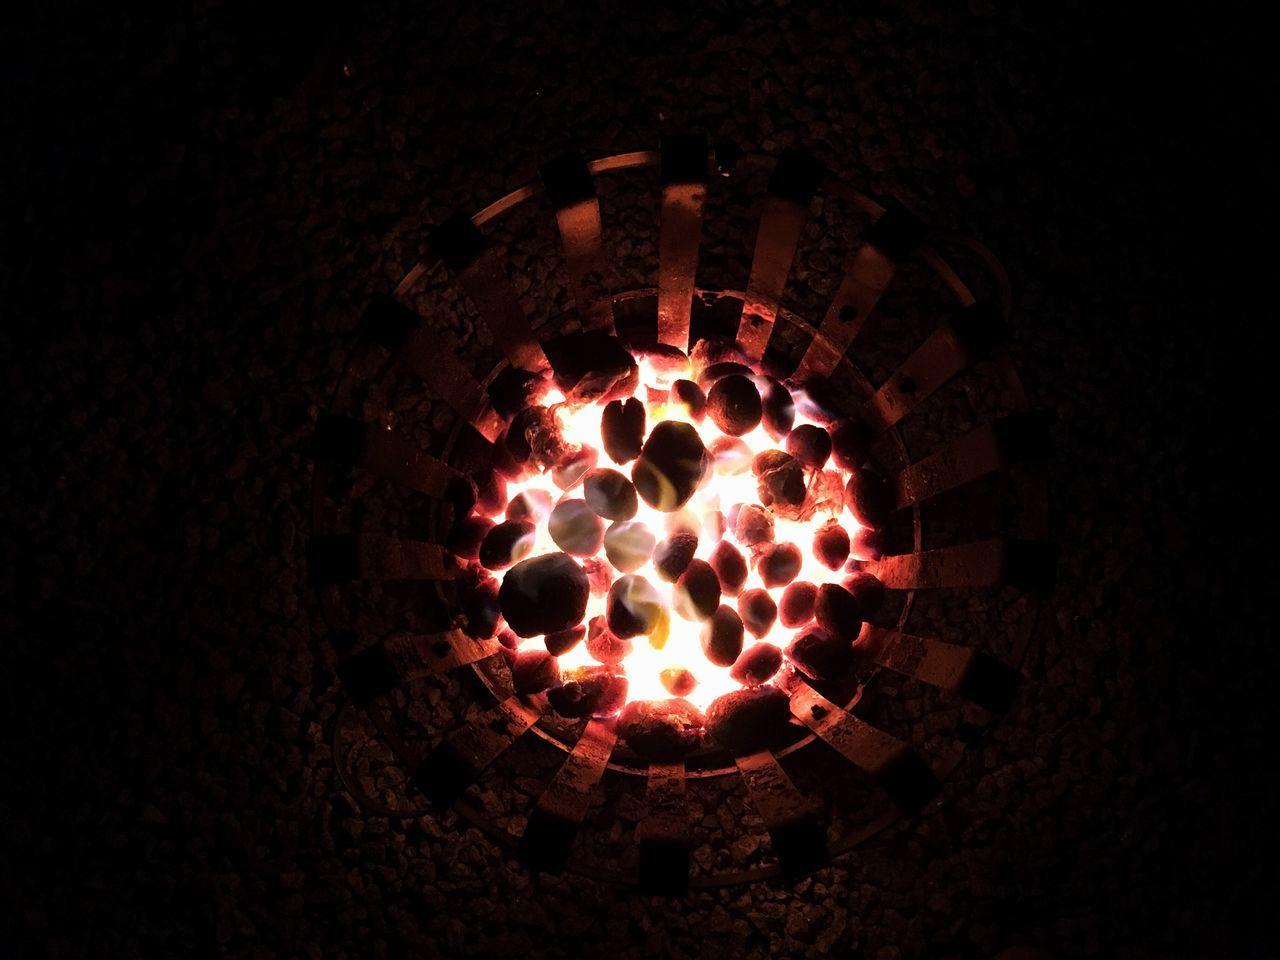 flame, glowing, heat - temperature, high angle view, burning, illuminated, night, no people, diya - oil lamp, indoors, diwali, food, close-up